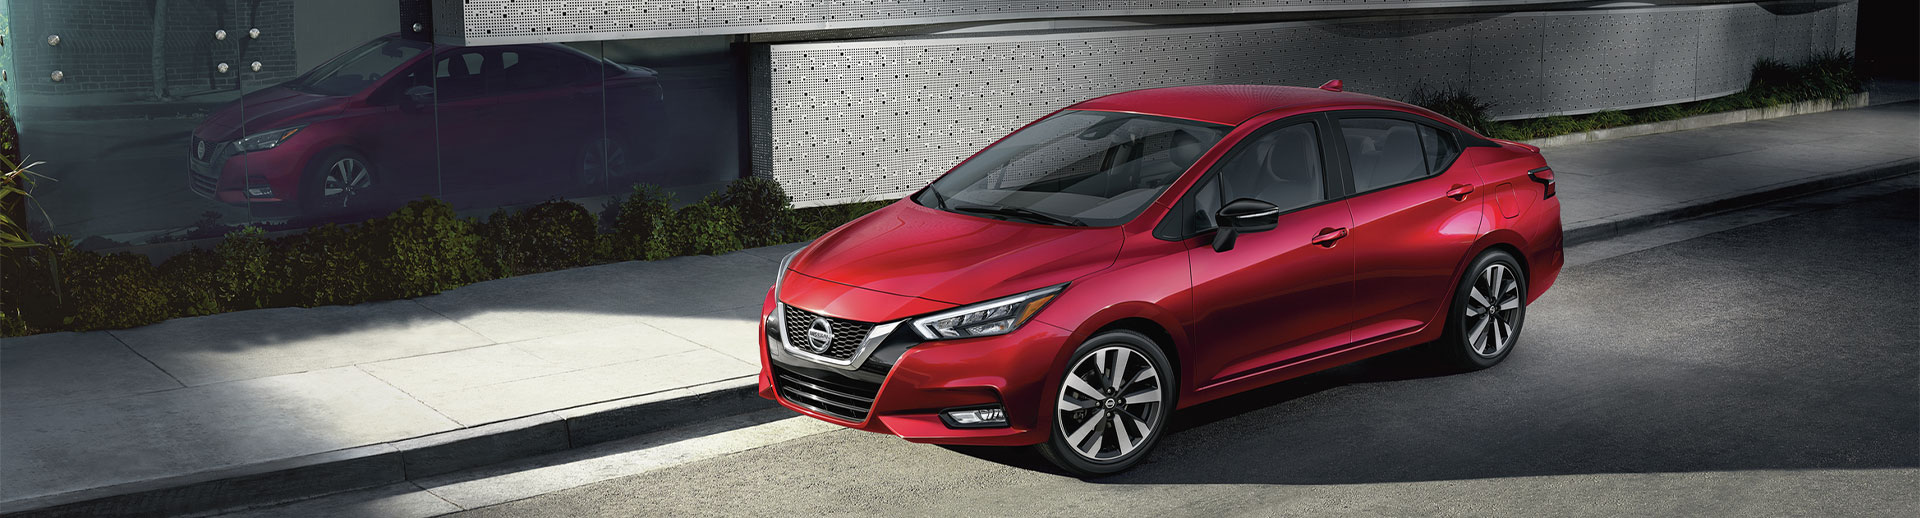 2021 Nissan Versa Lifestyle Photo